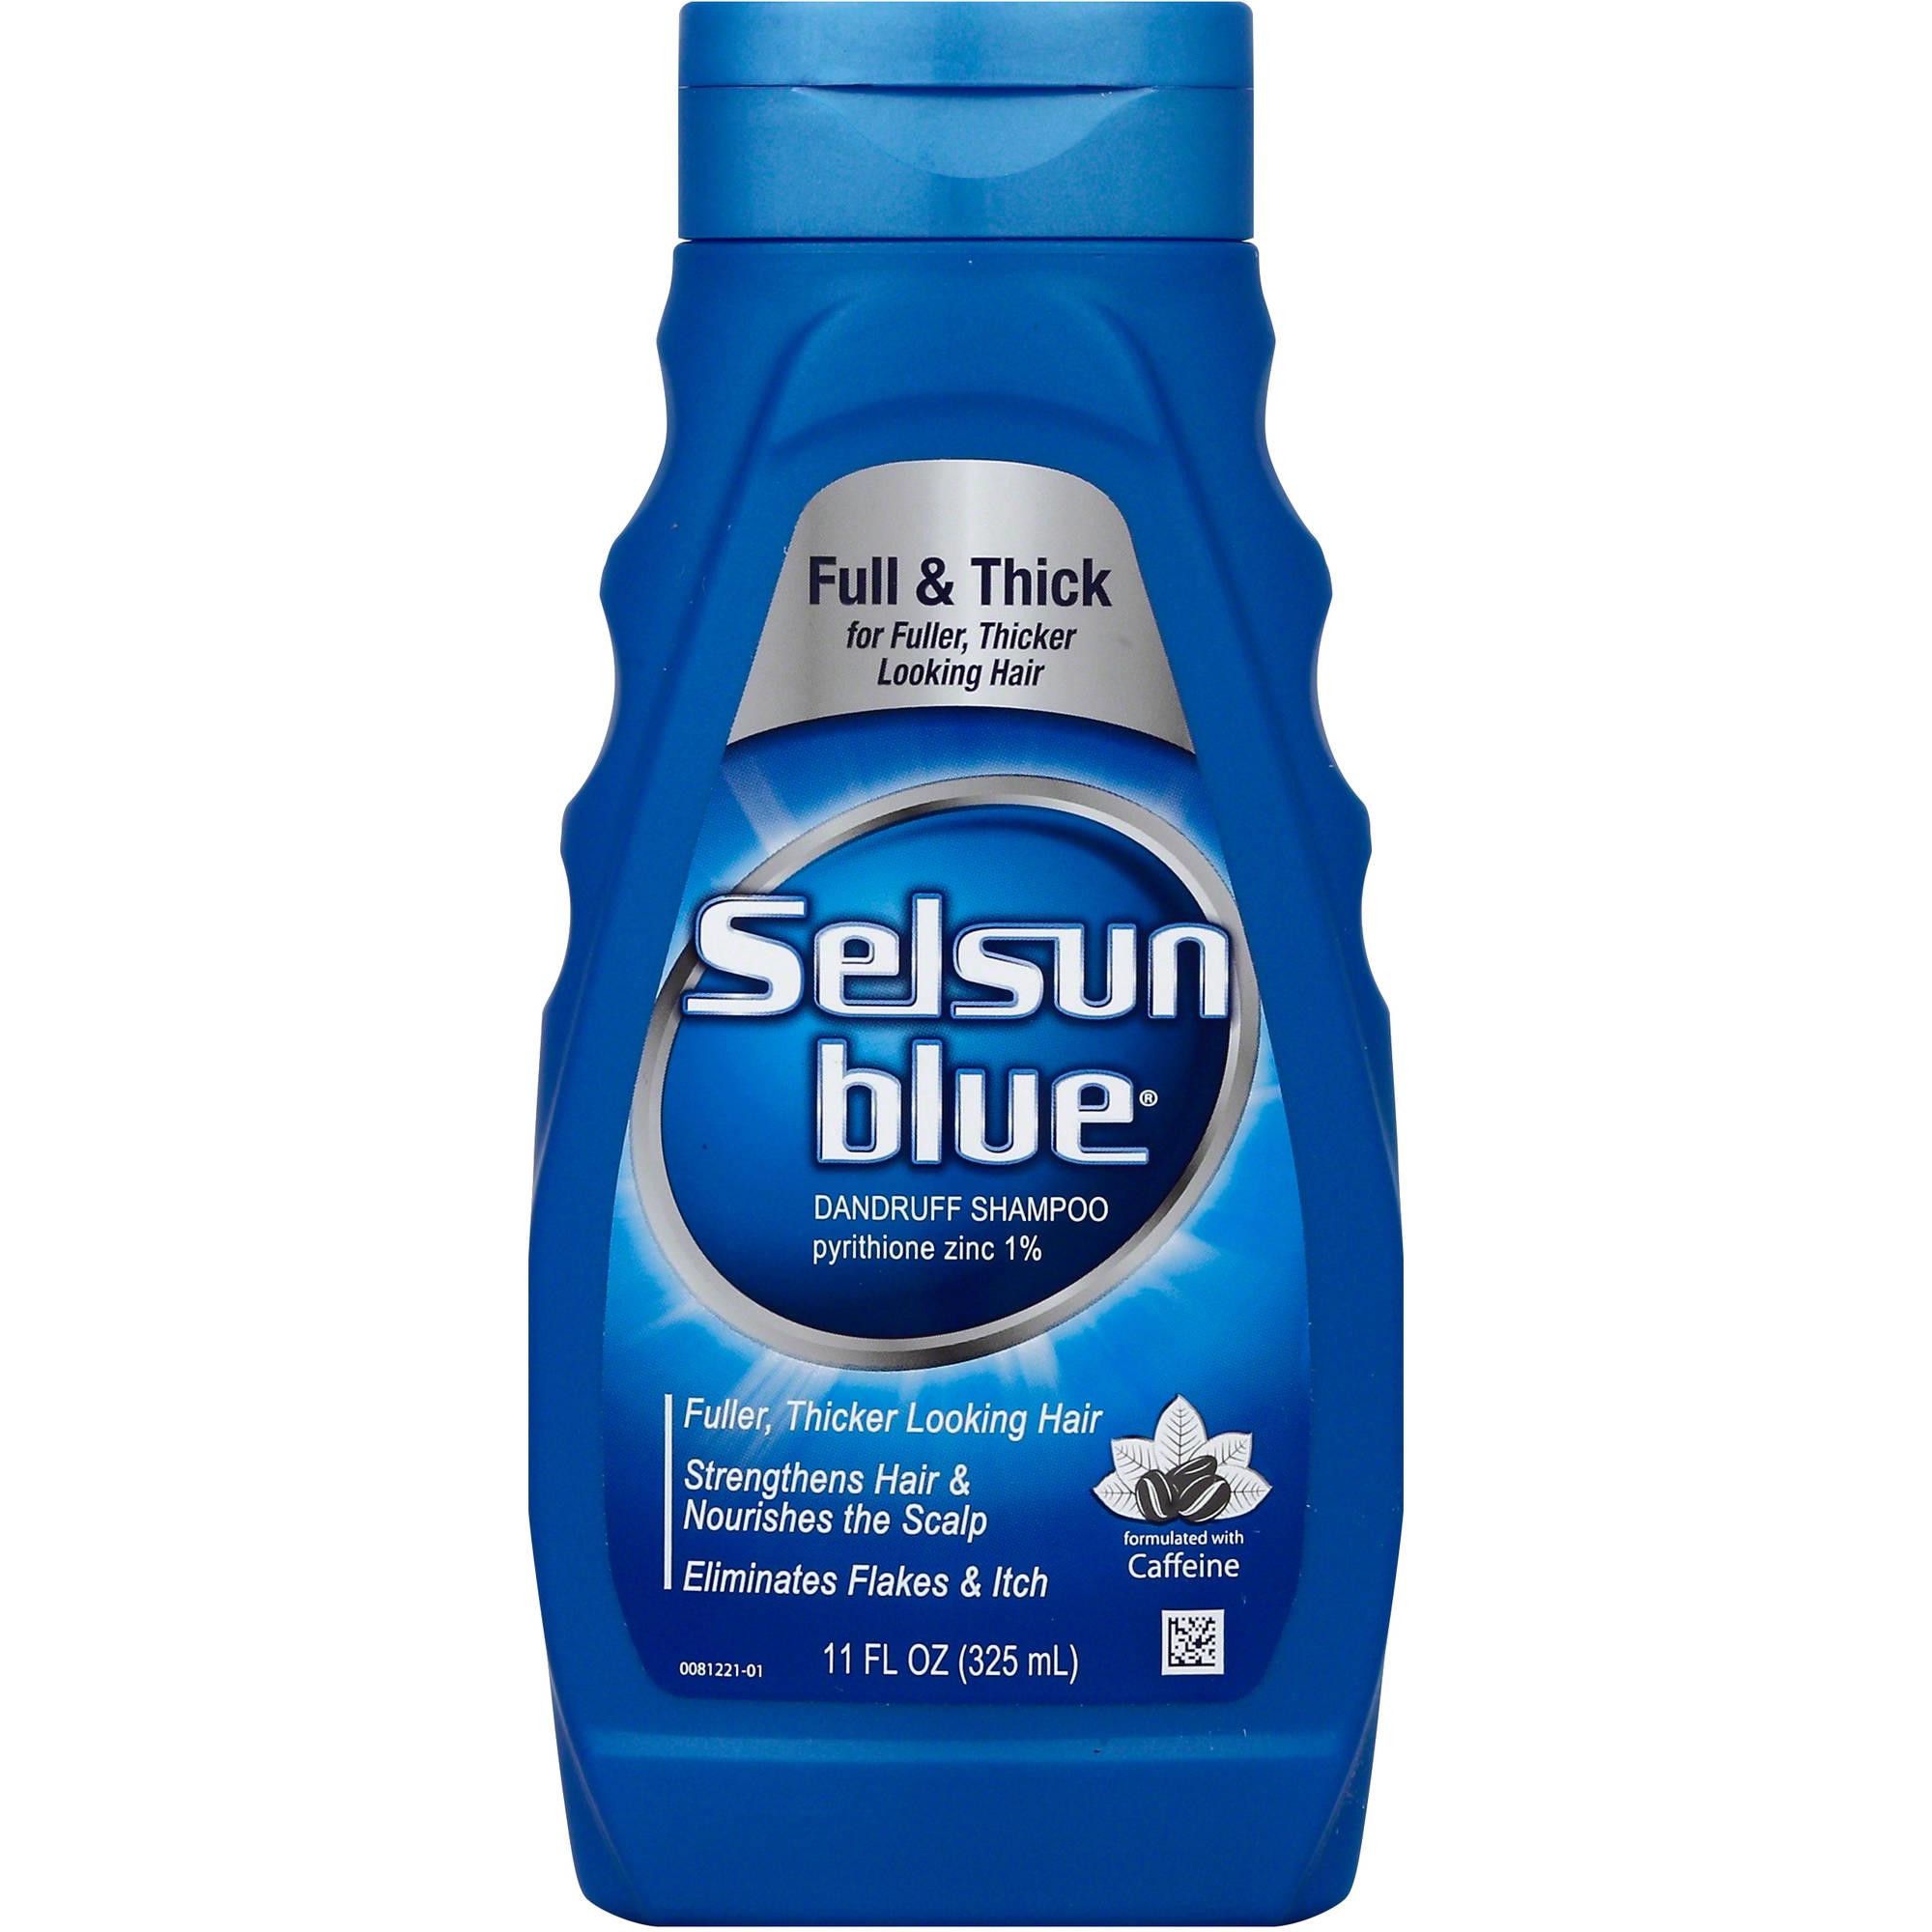 Selsun Blue Full & Thick Dandruff Shampoo, 11 fl oz